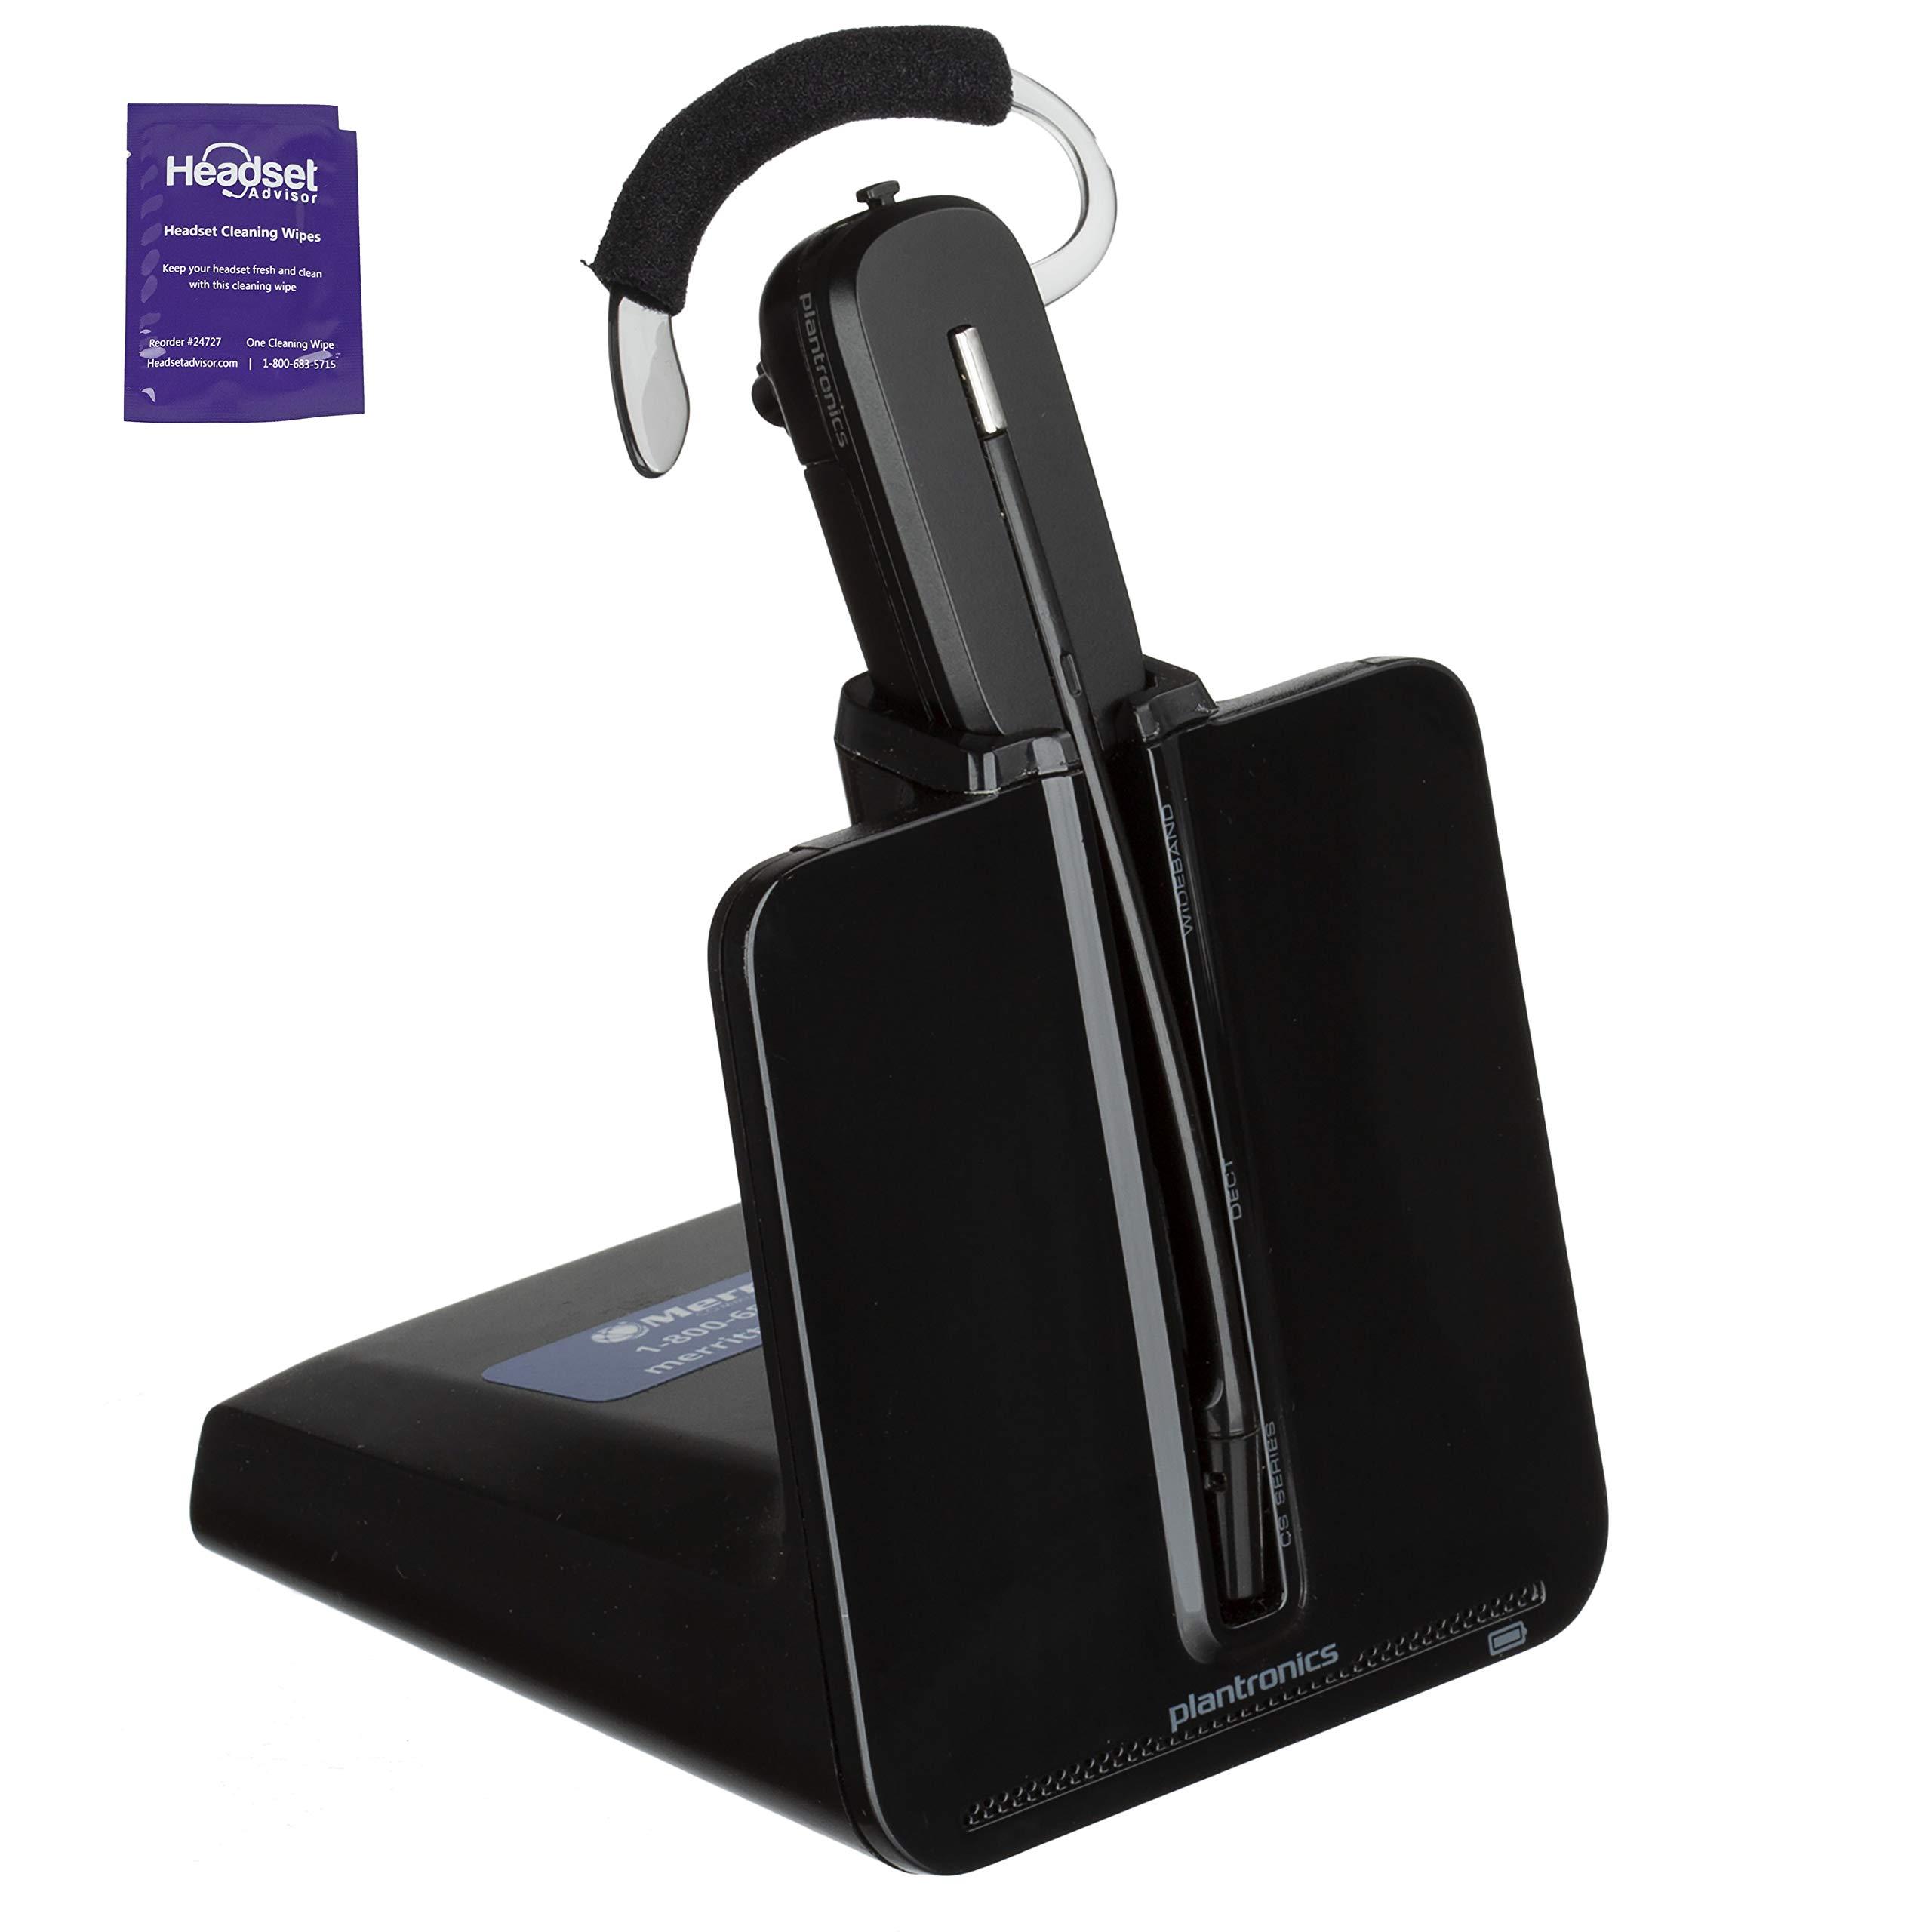 Plantronics CS540 Wireless Office Headset Bundle with Headset Advisor Wipe (Renewed)